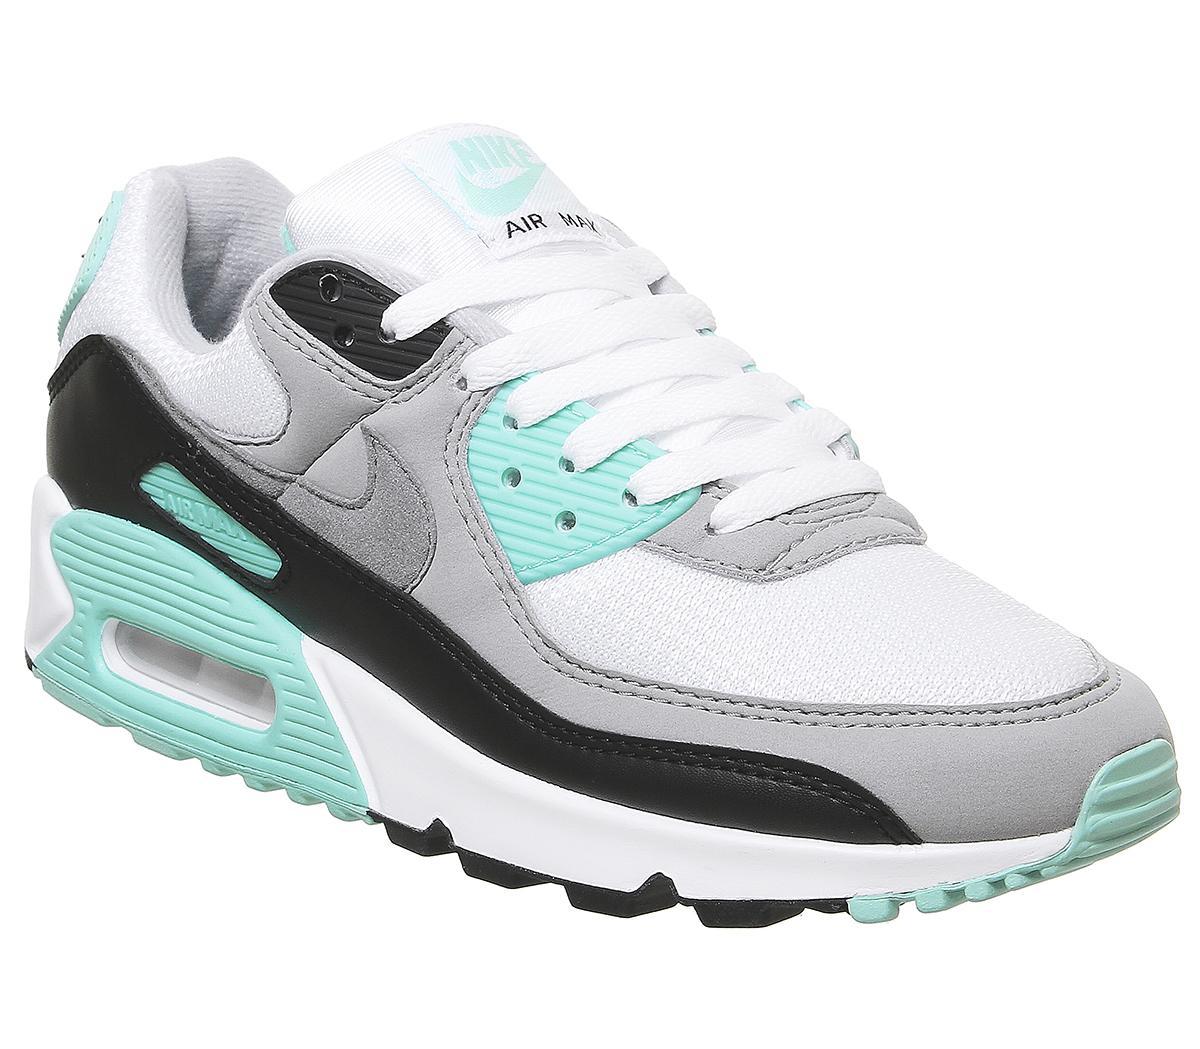 Gaseoso Avanzar por qué  Nike Air Max 90 Trainers White Grey Hyper Turquoise - Hers trainers